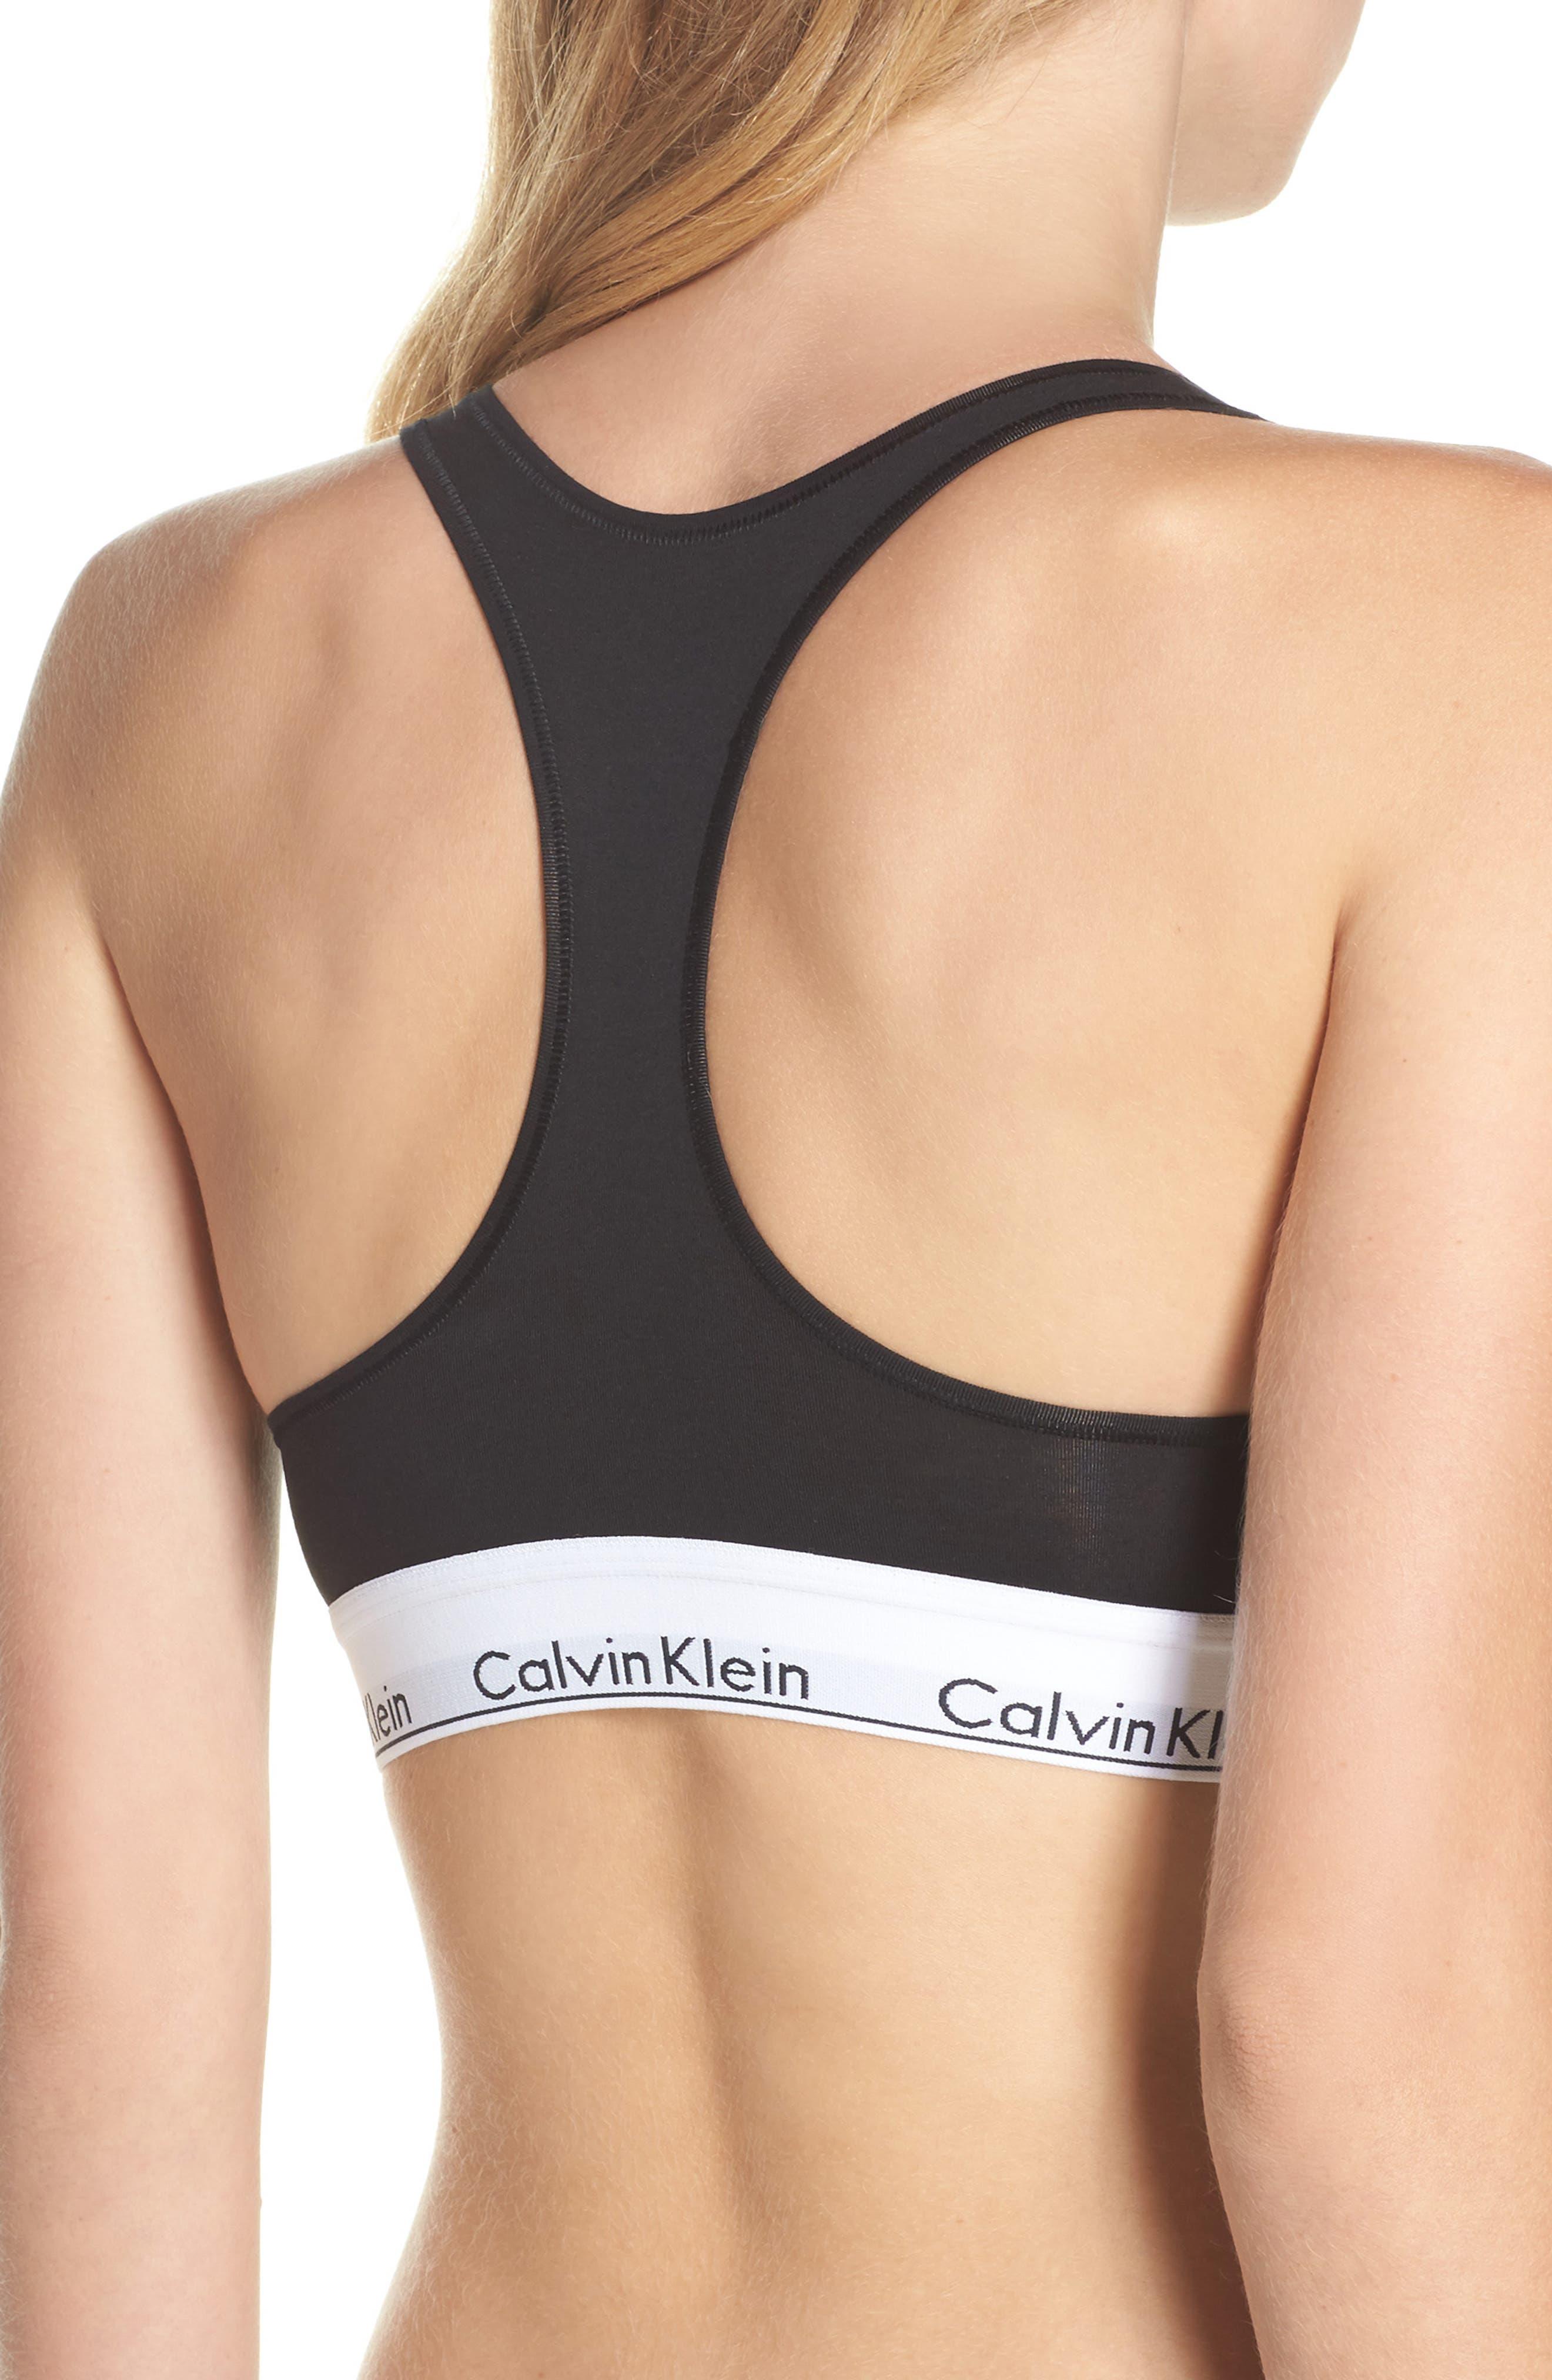 ff8707187f7 Calvin Klein Women s Lingerie  Bras   Panties